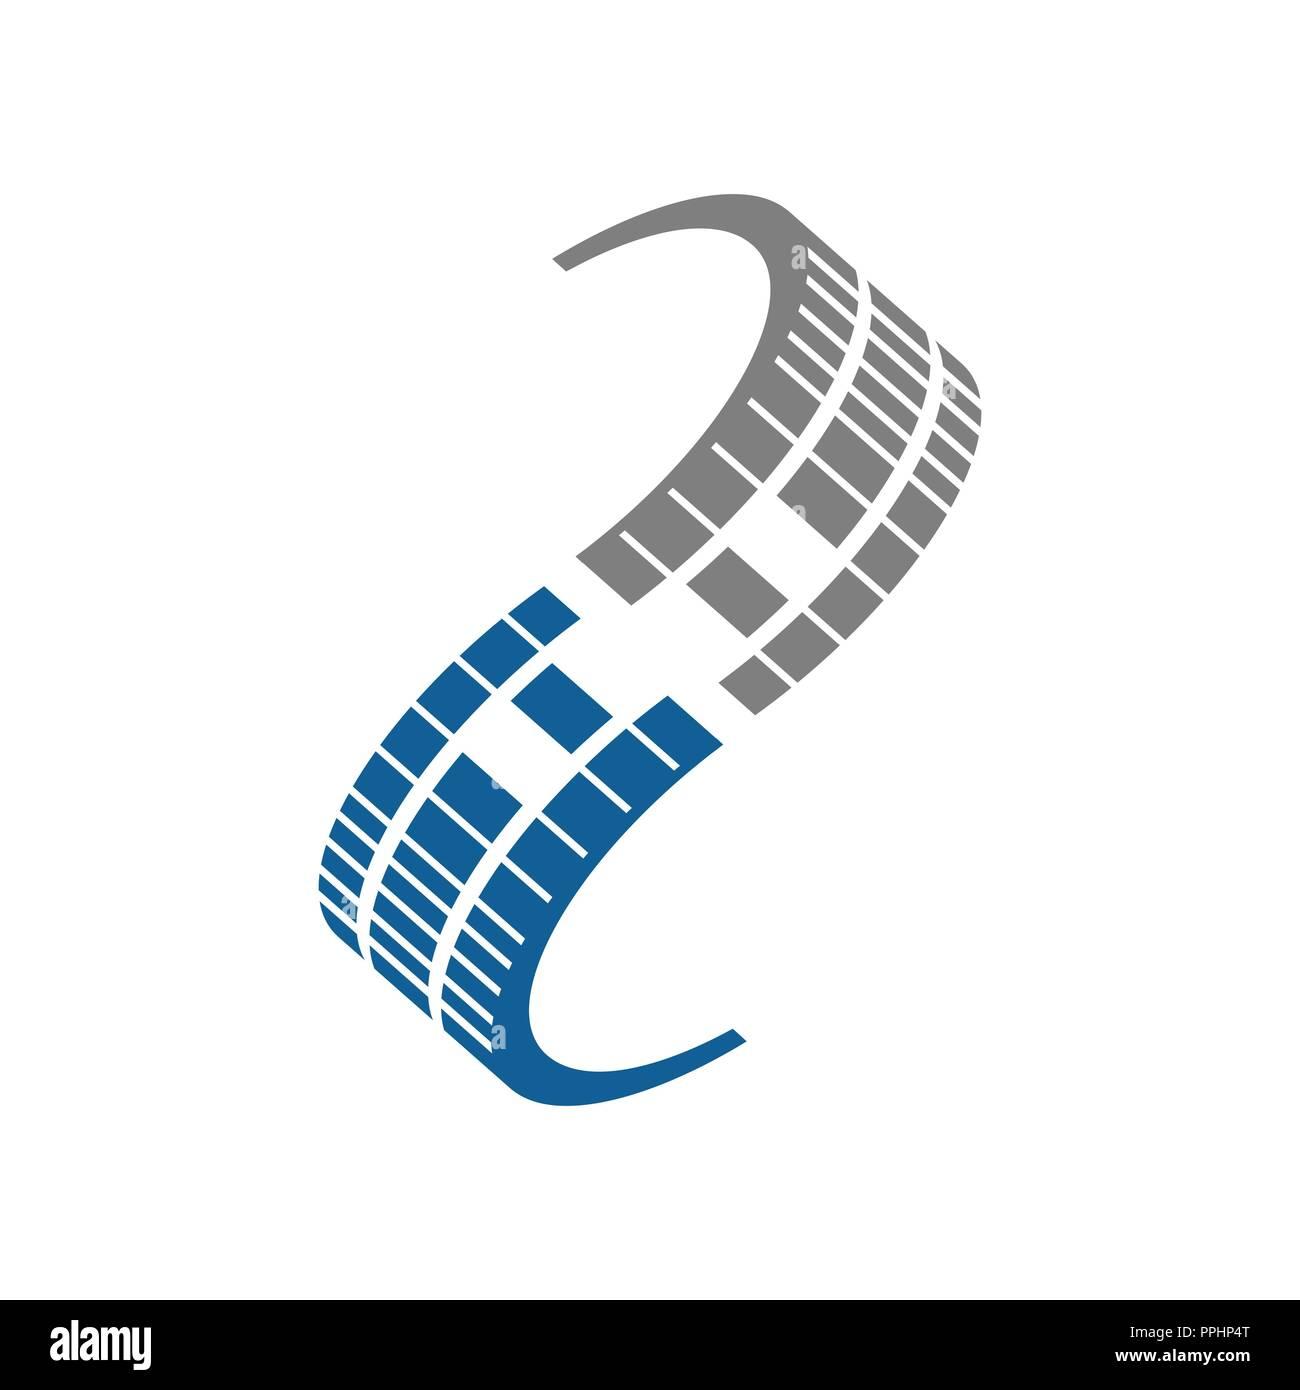 Heavy Industry, Machinery, Engineering abstract sign Gear, Cog icon. Mechanics wheel element. Teamwork process. Branding Identity Corporate vector log - Stock Vector